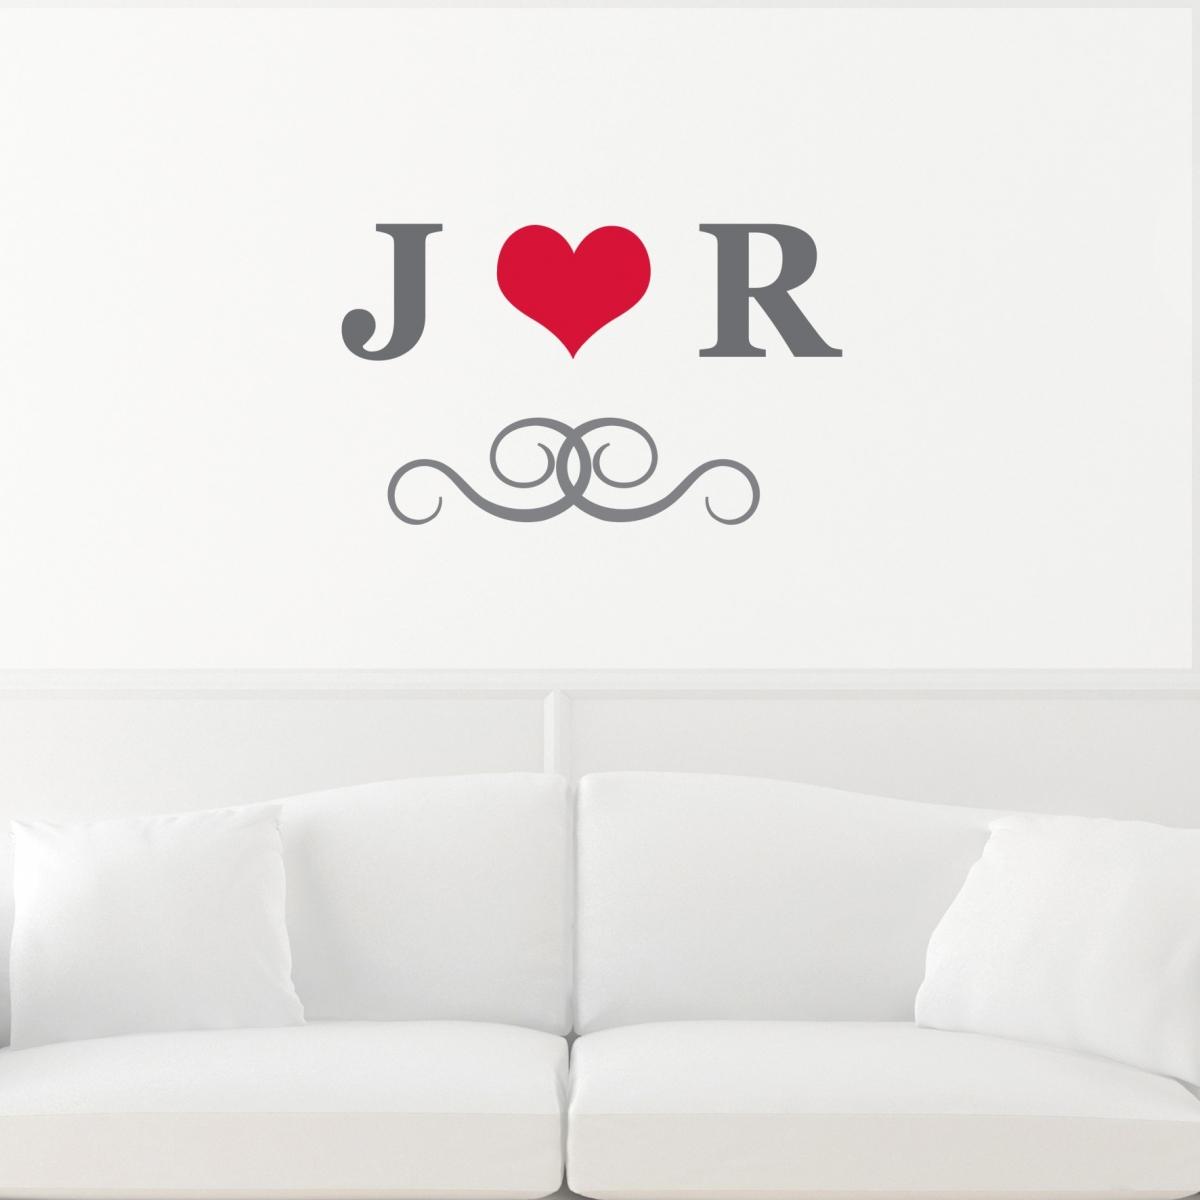 Personalised Monogram Wall Art